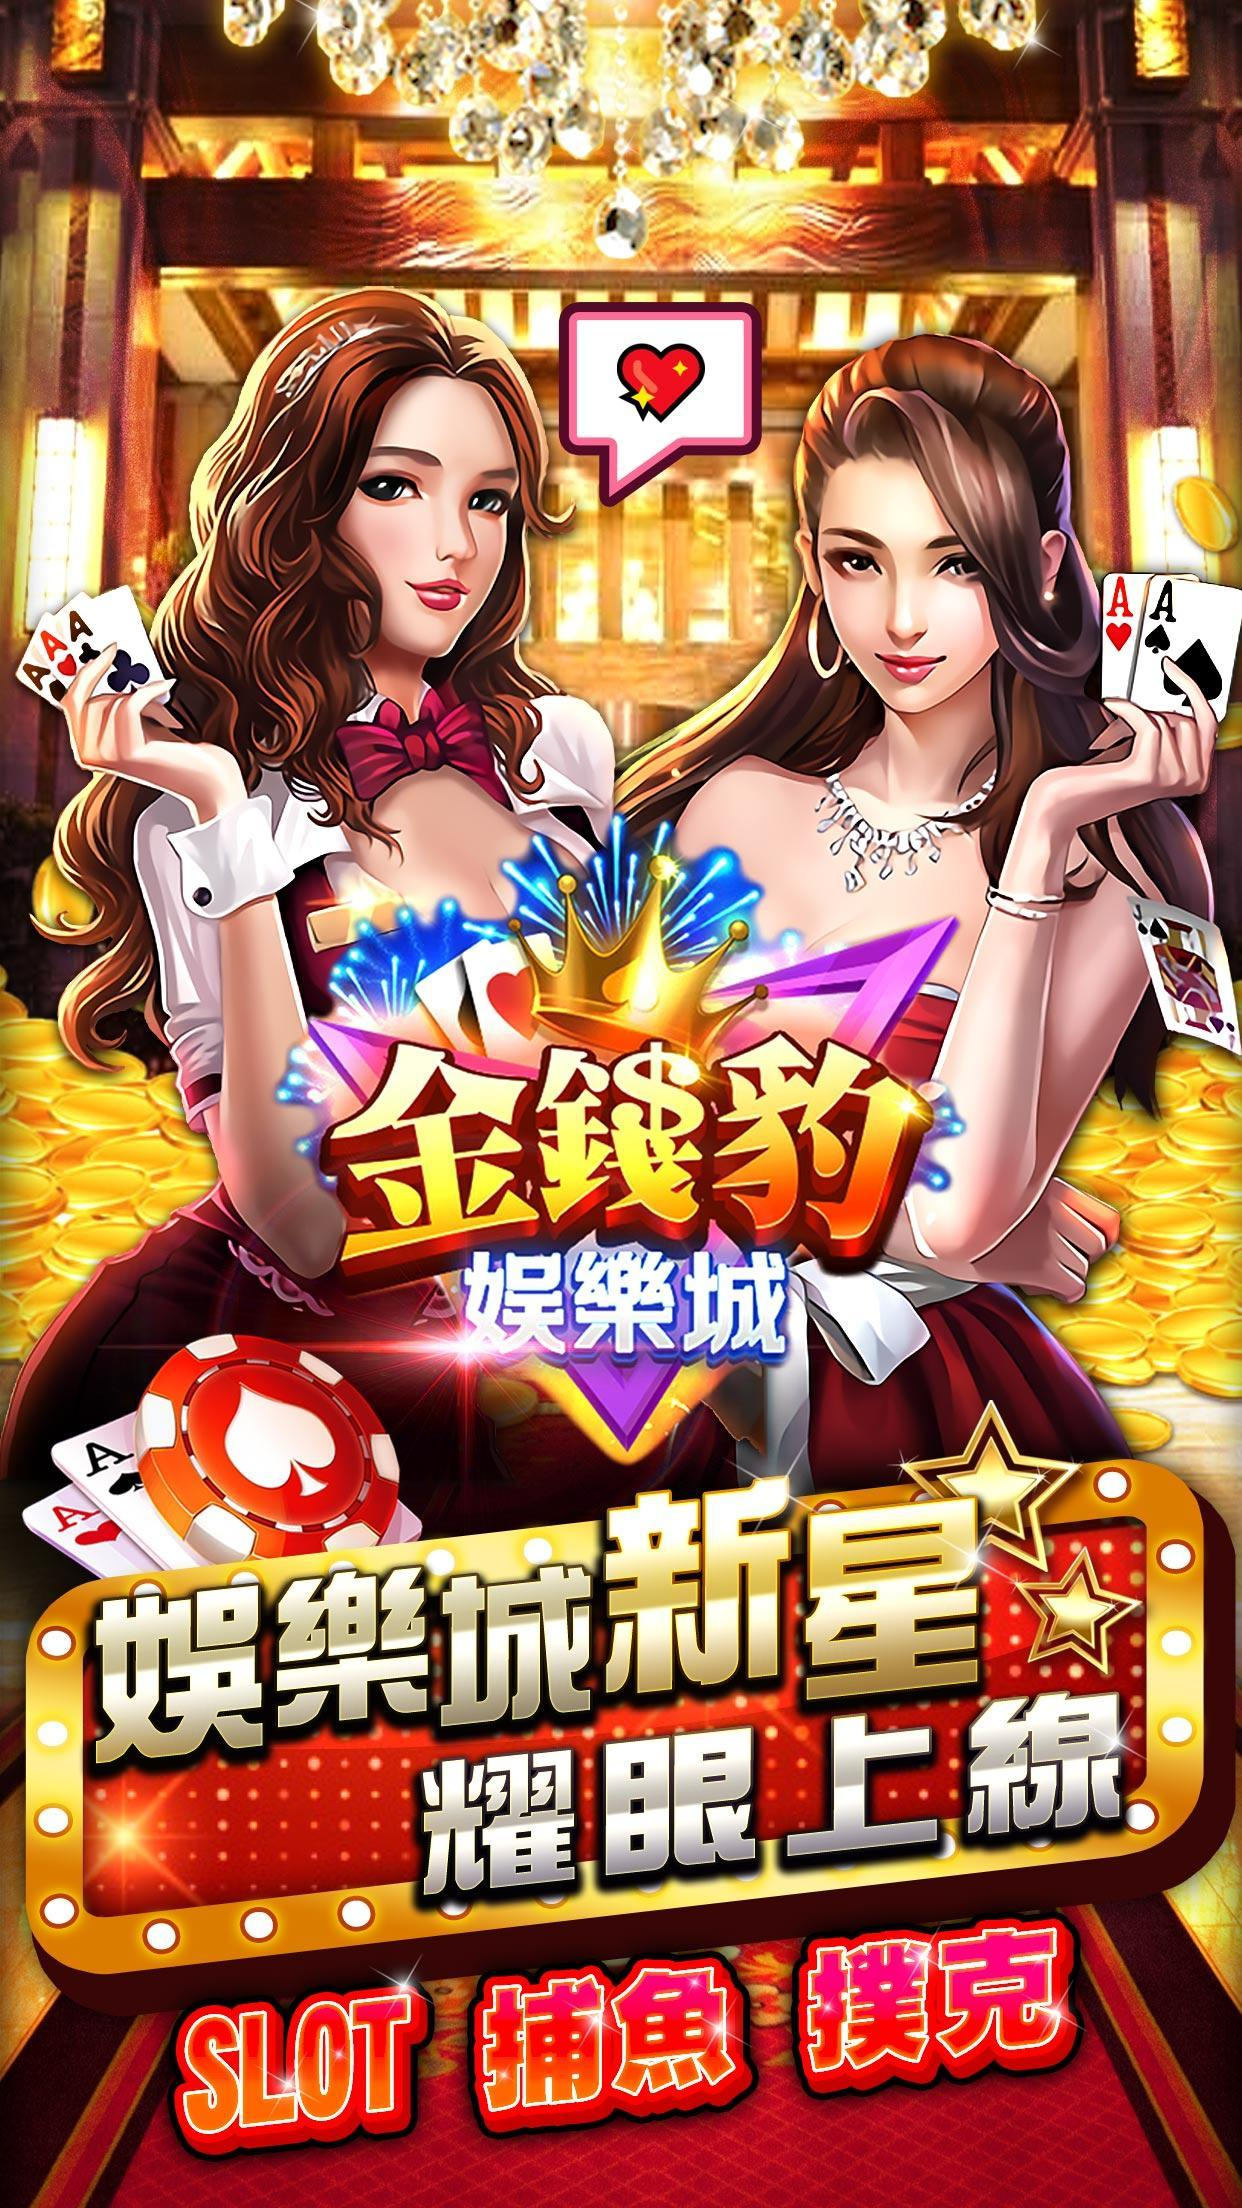 金錢豹娛樂城 2.0.0 Screenshot 1